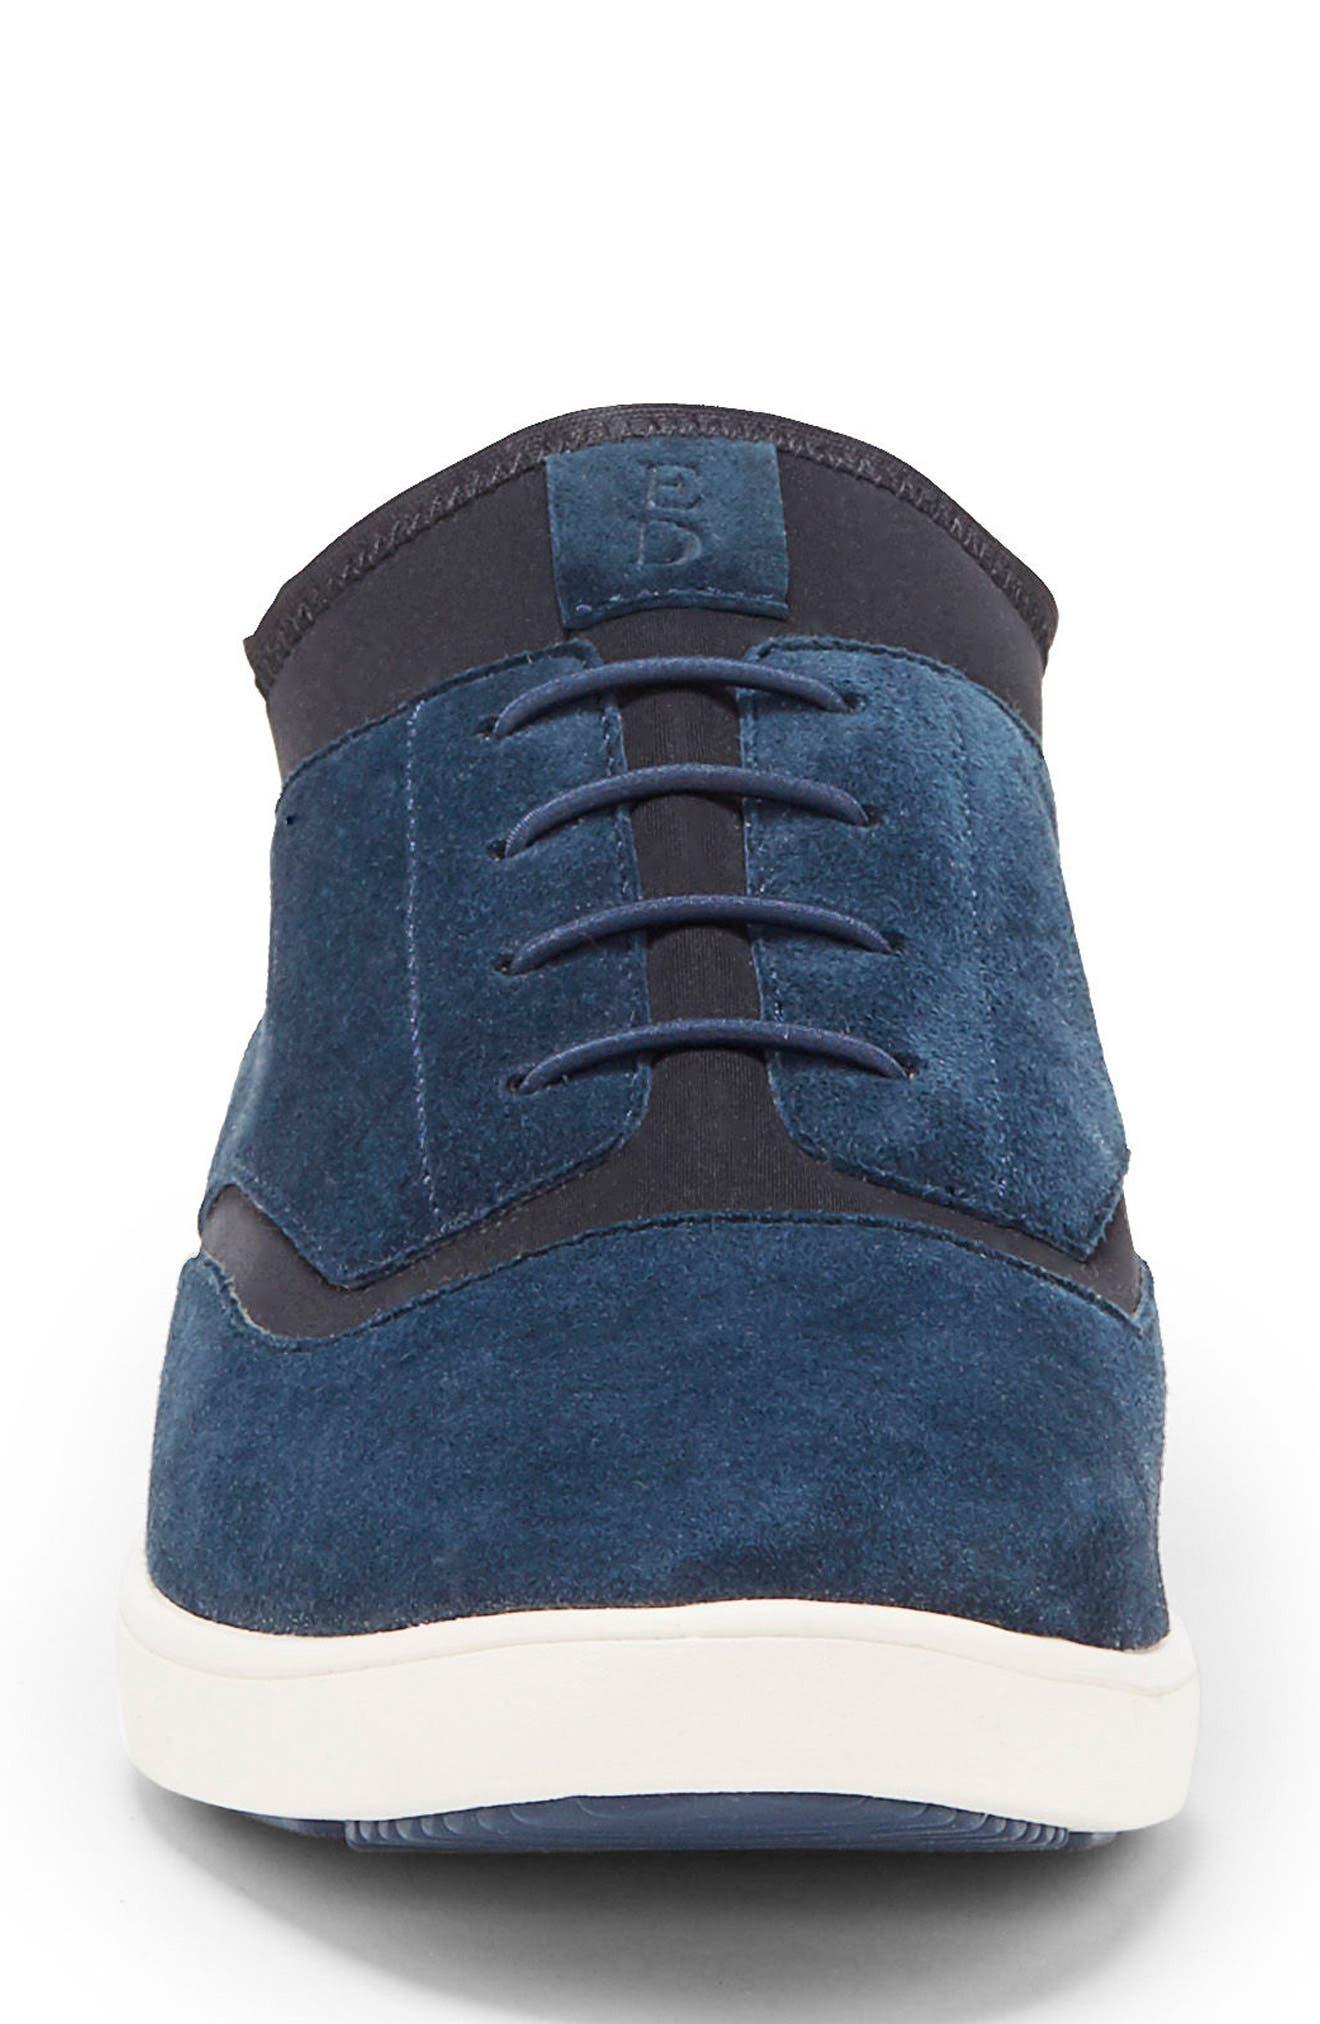 Atala Sneaker,                             Alternate thumbnail 9, color,